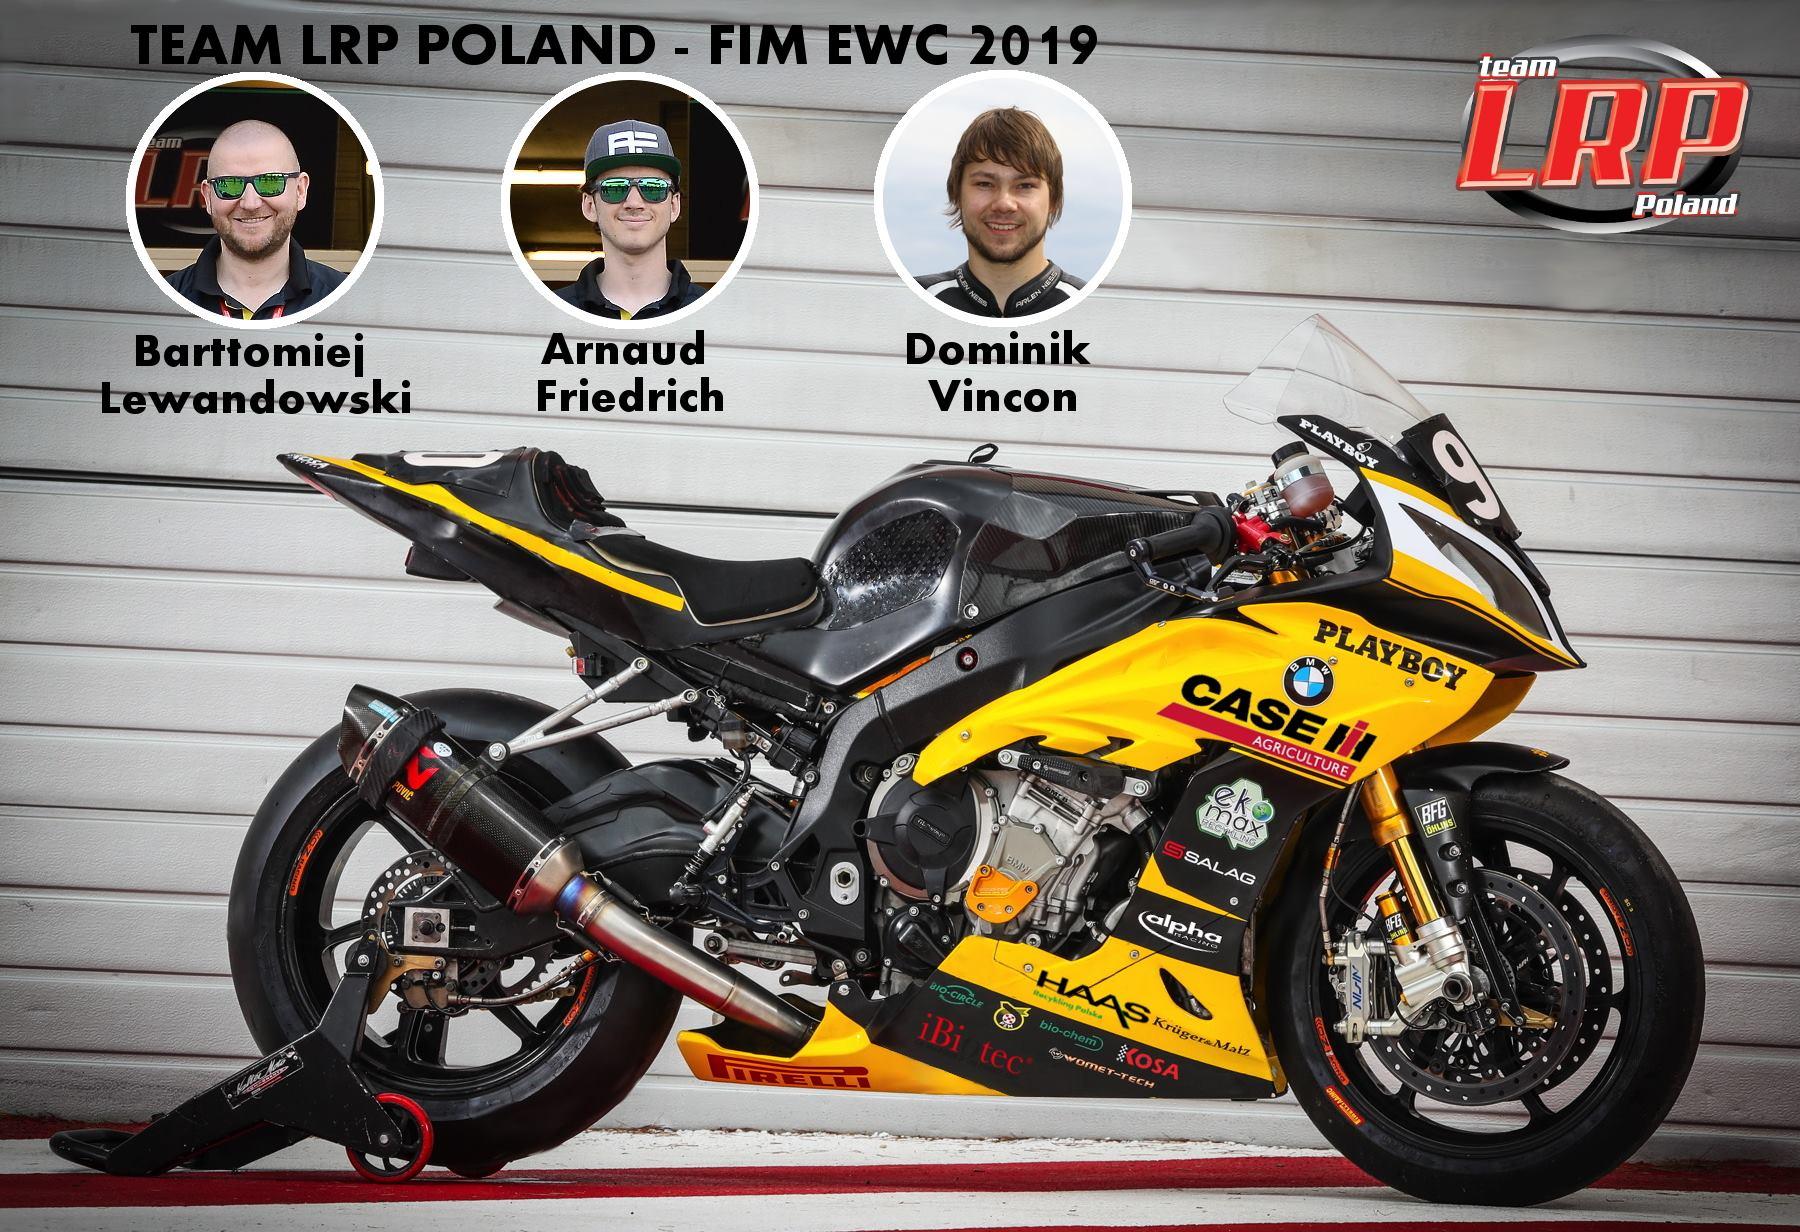 Team LRP Poland